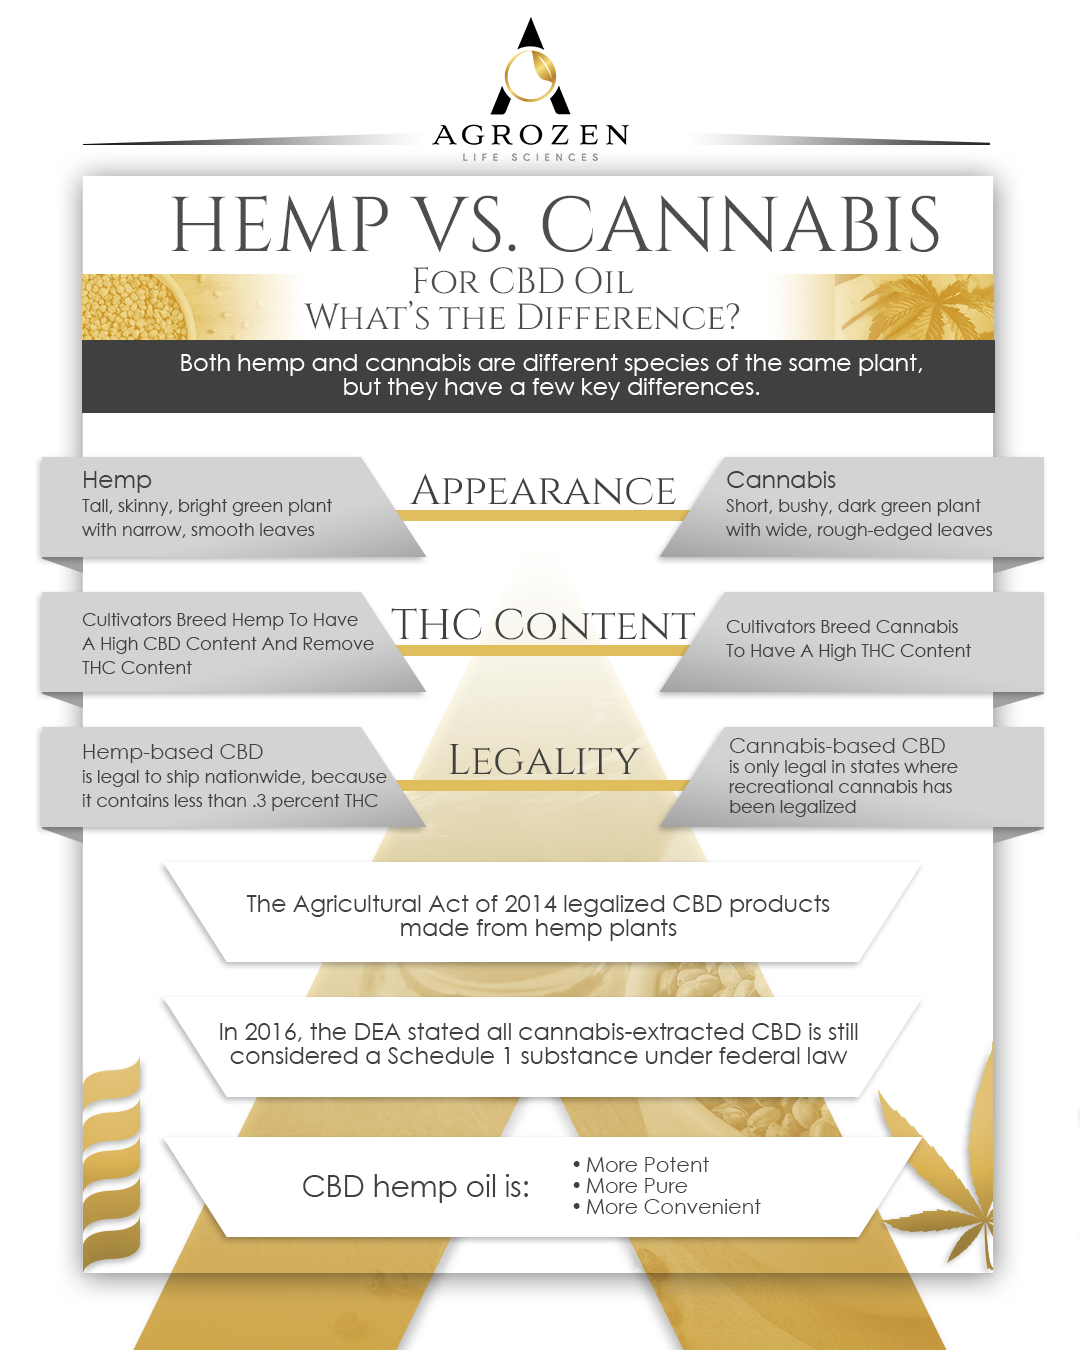 Hemp vs. Cannabis